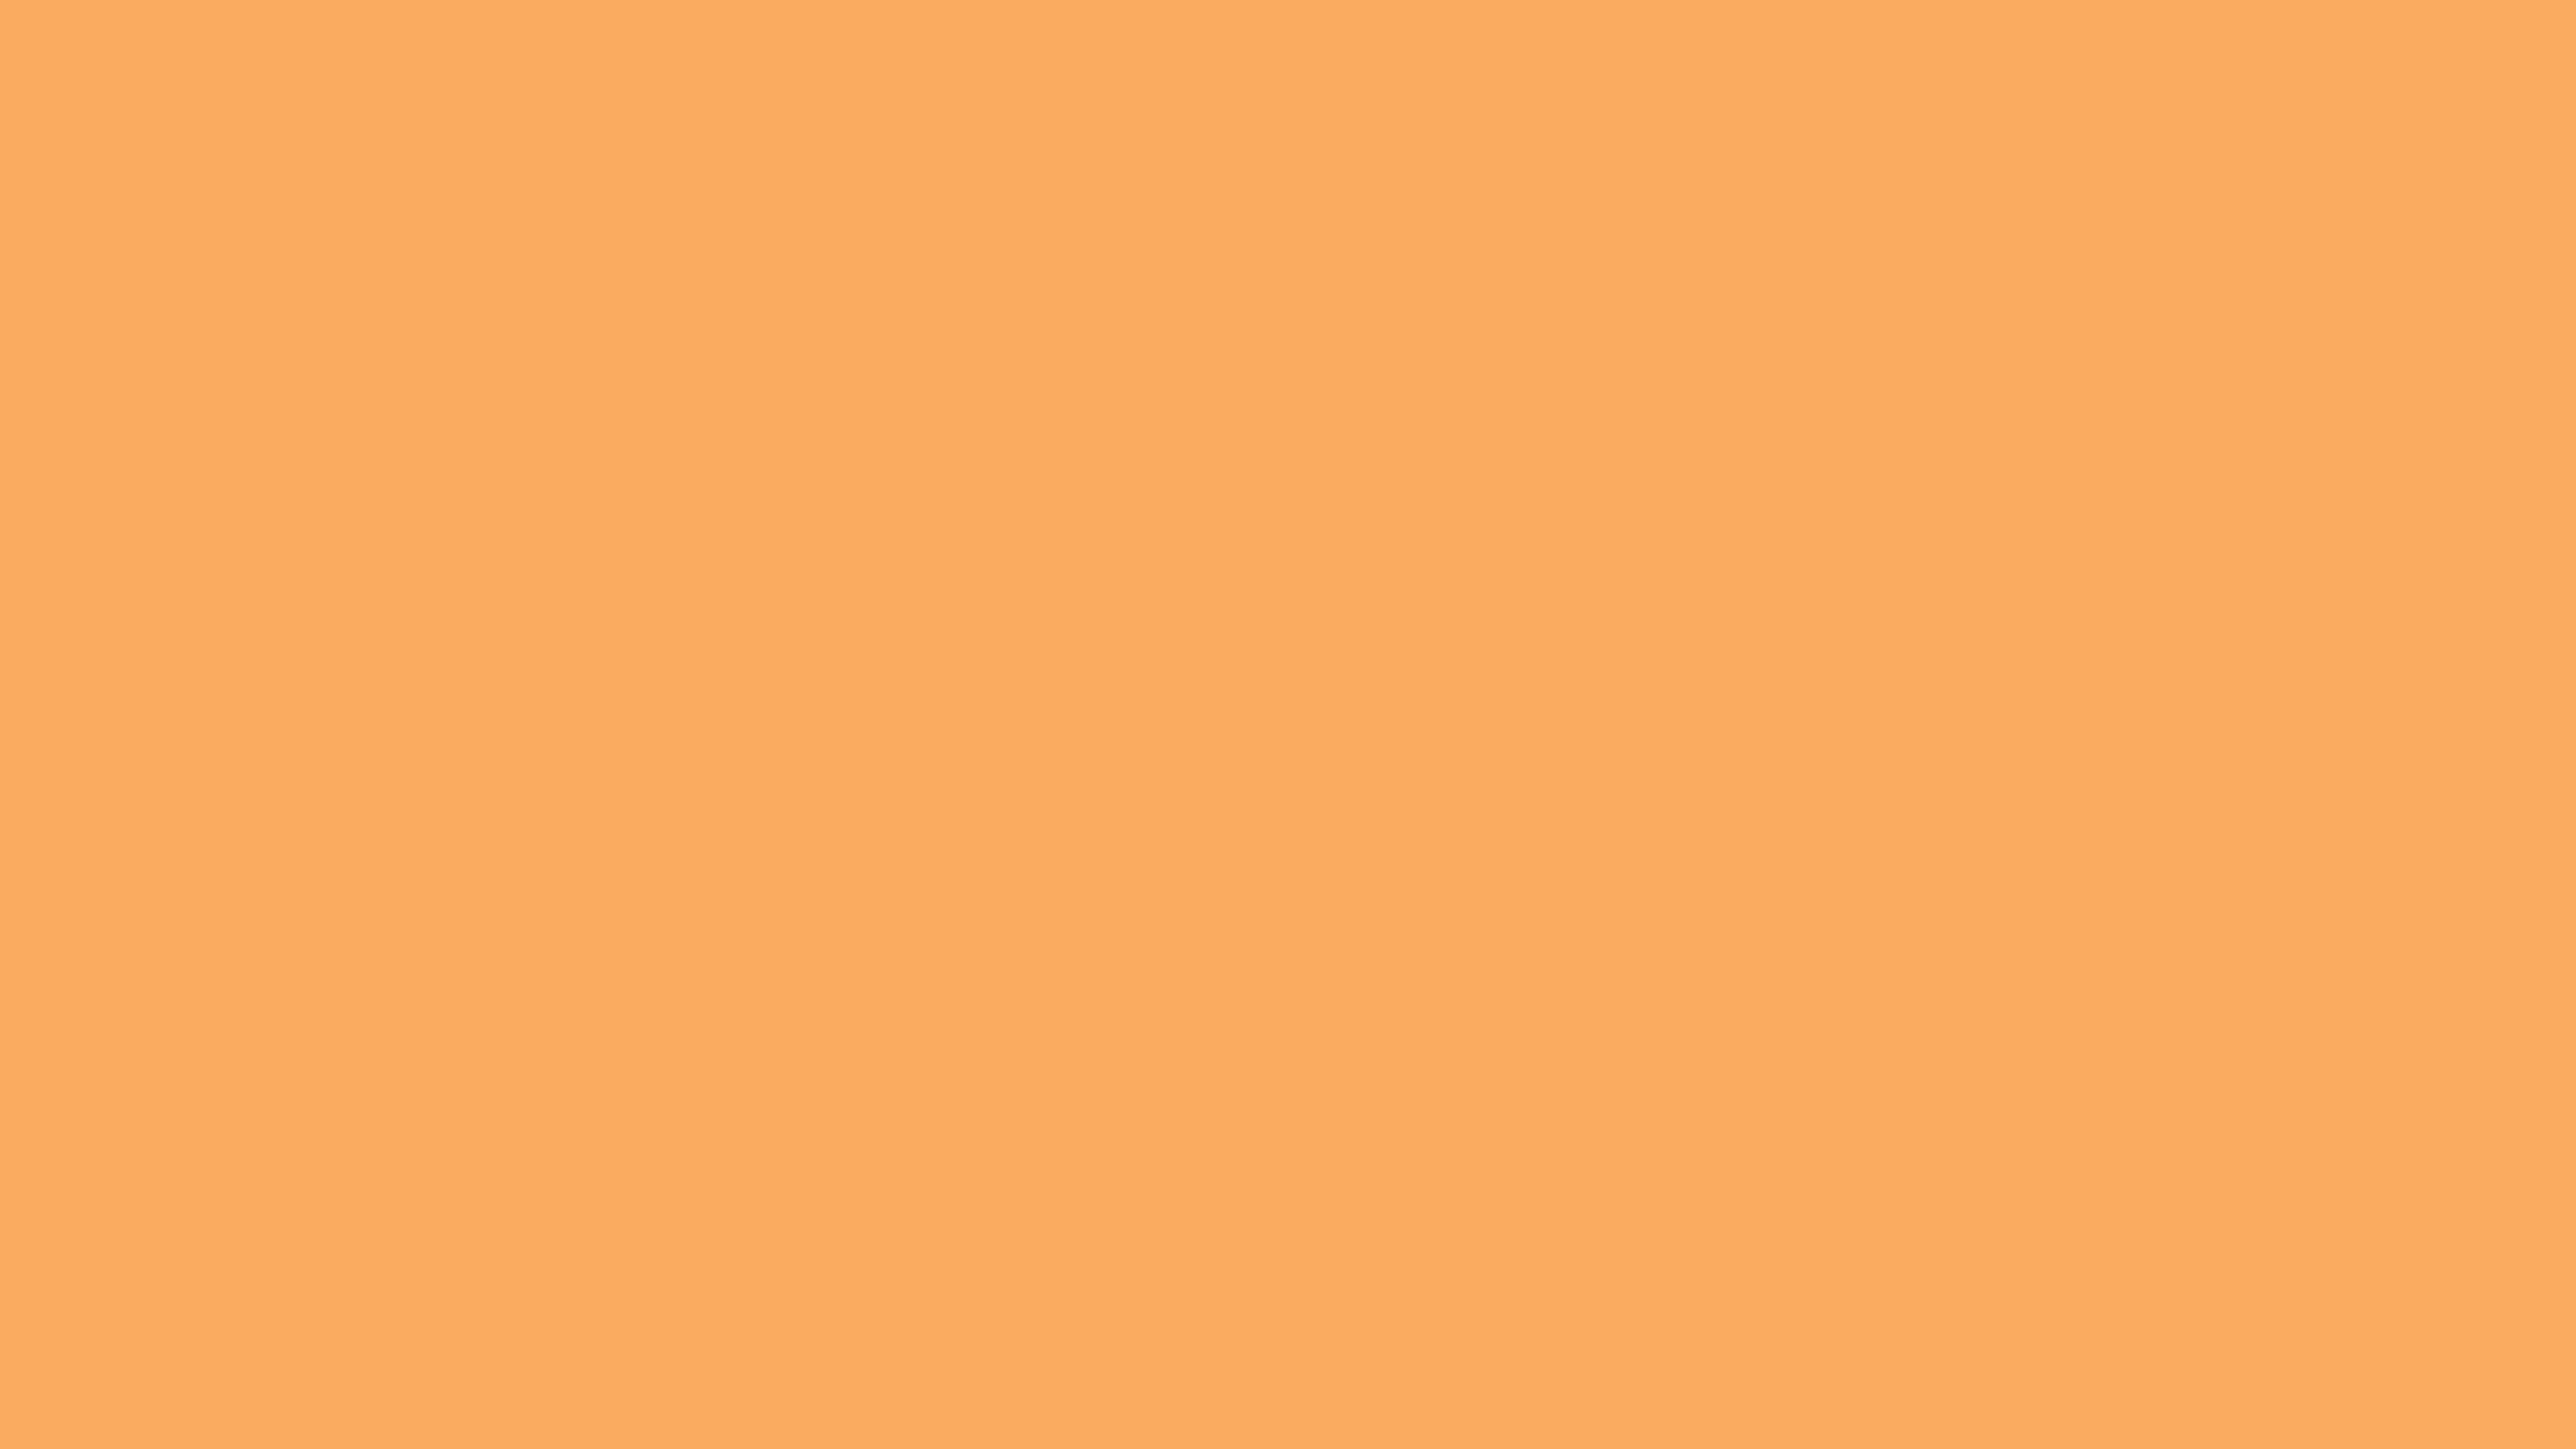 3840x2160 Rajah Solid Color Background